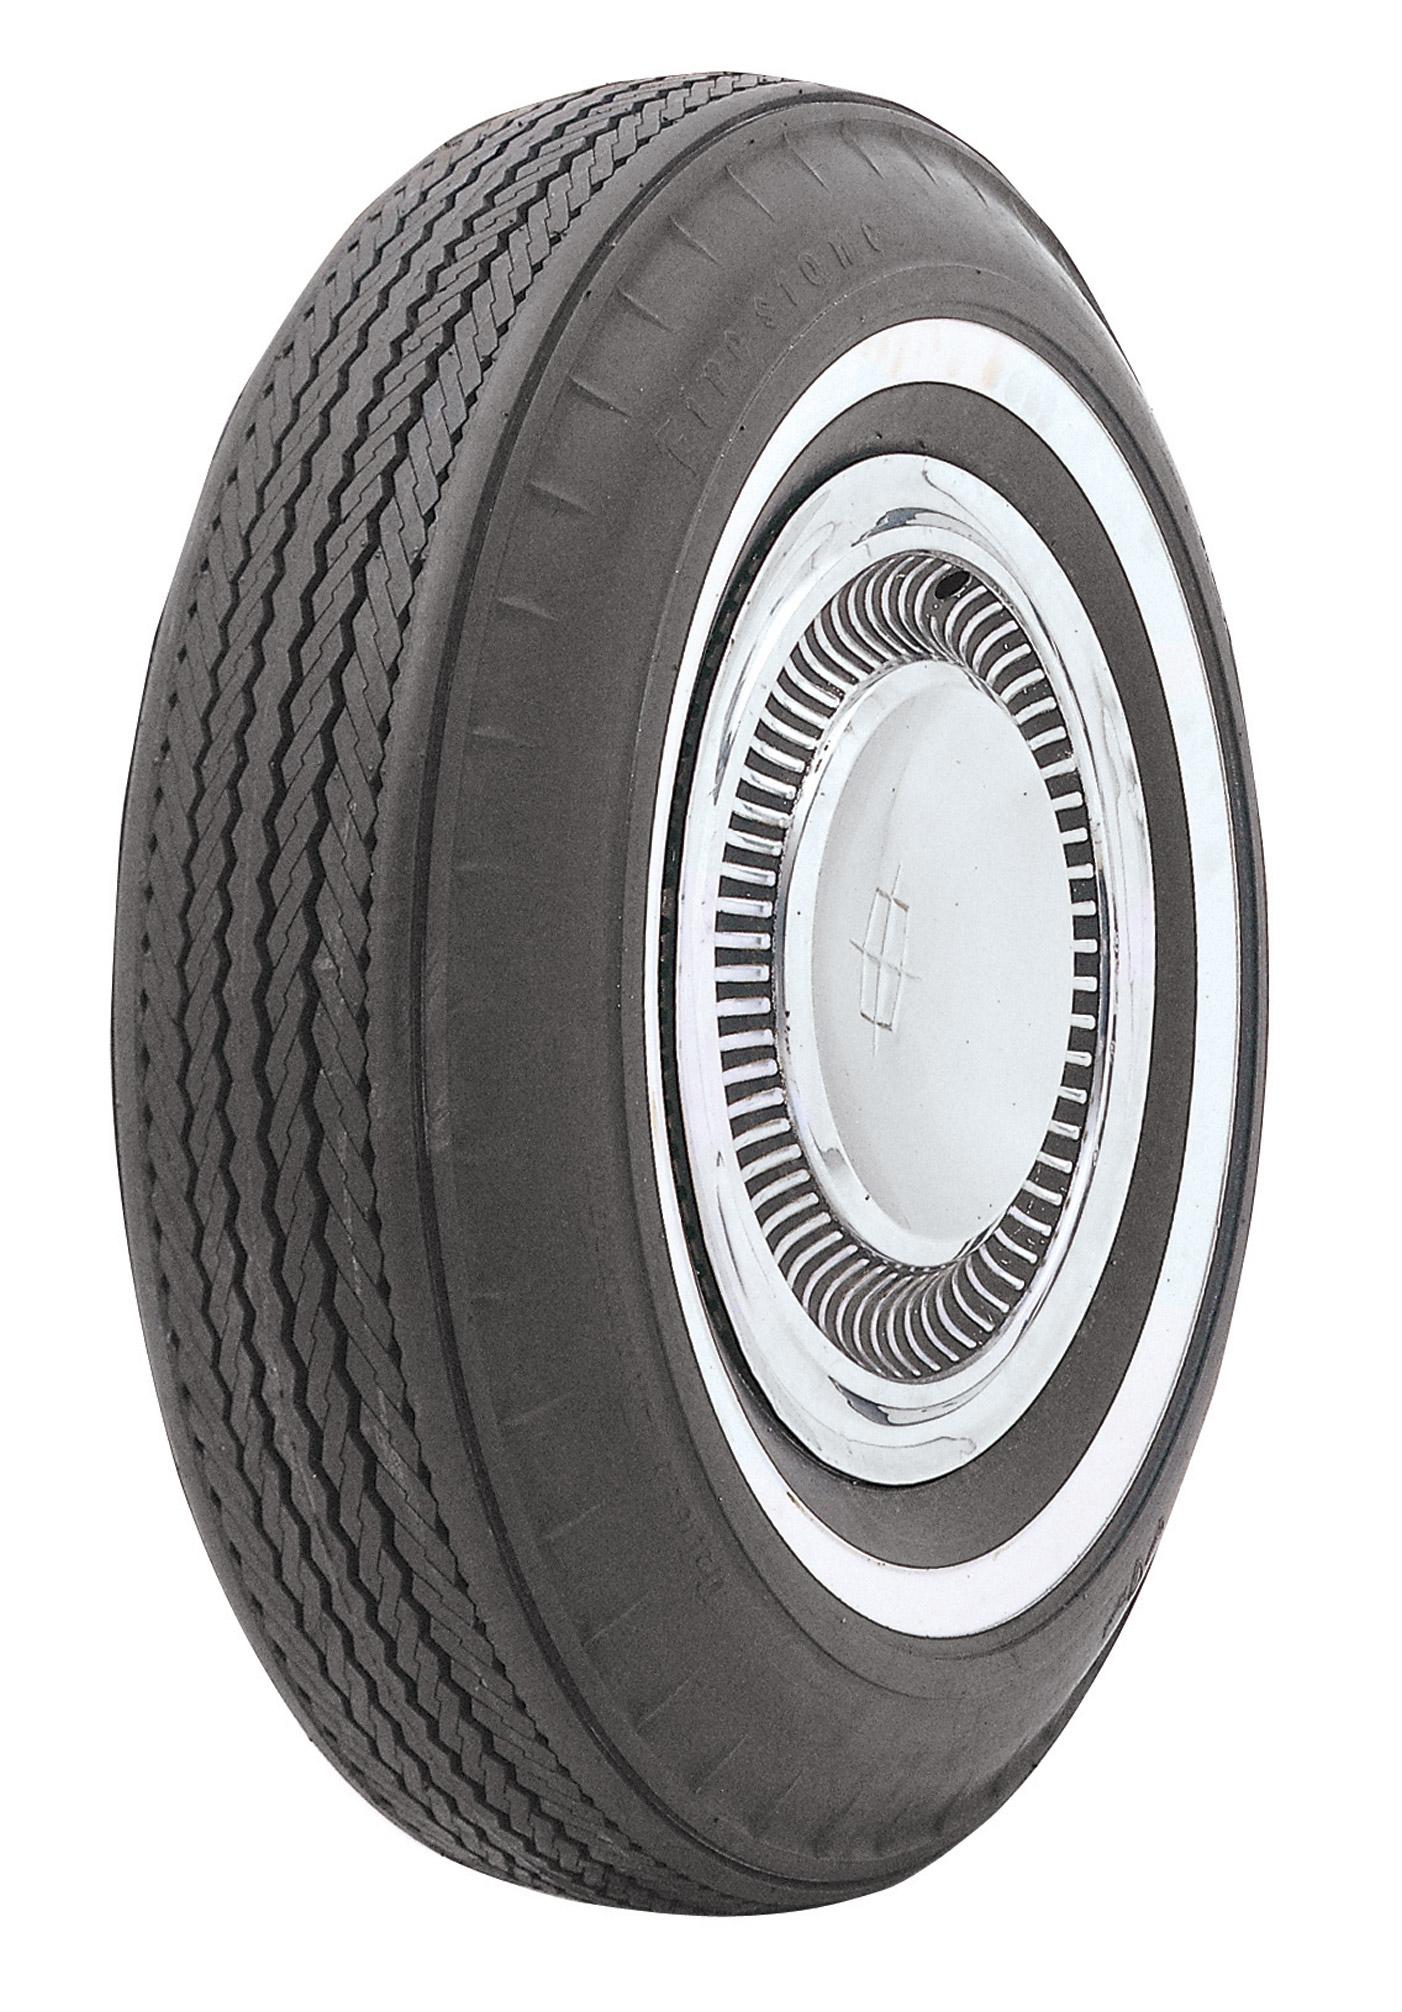 Discount Firestone Whitewall Tires | Firestone White walls